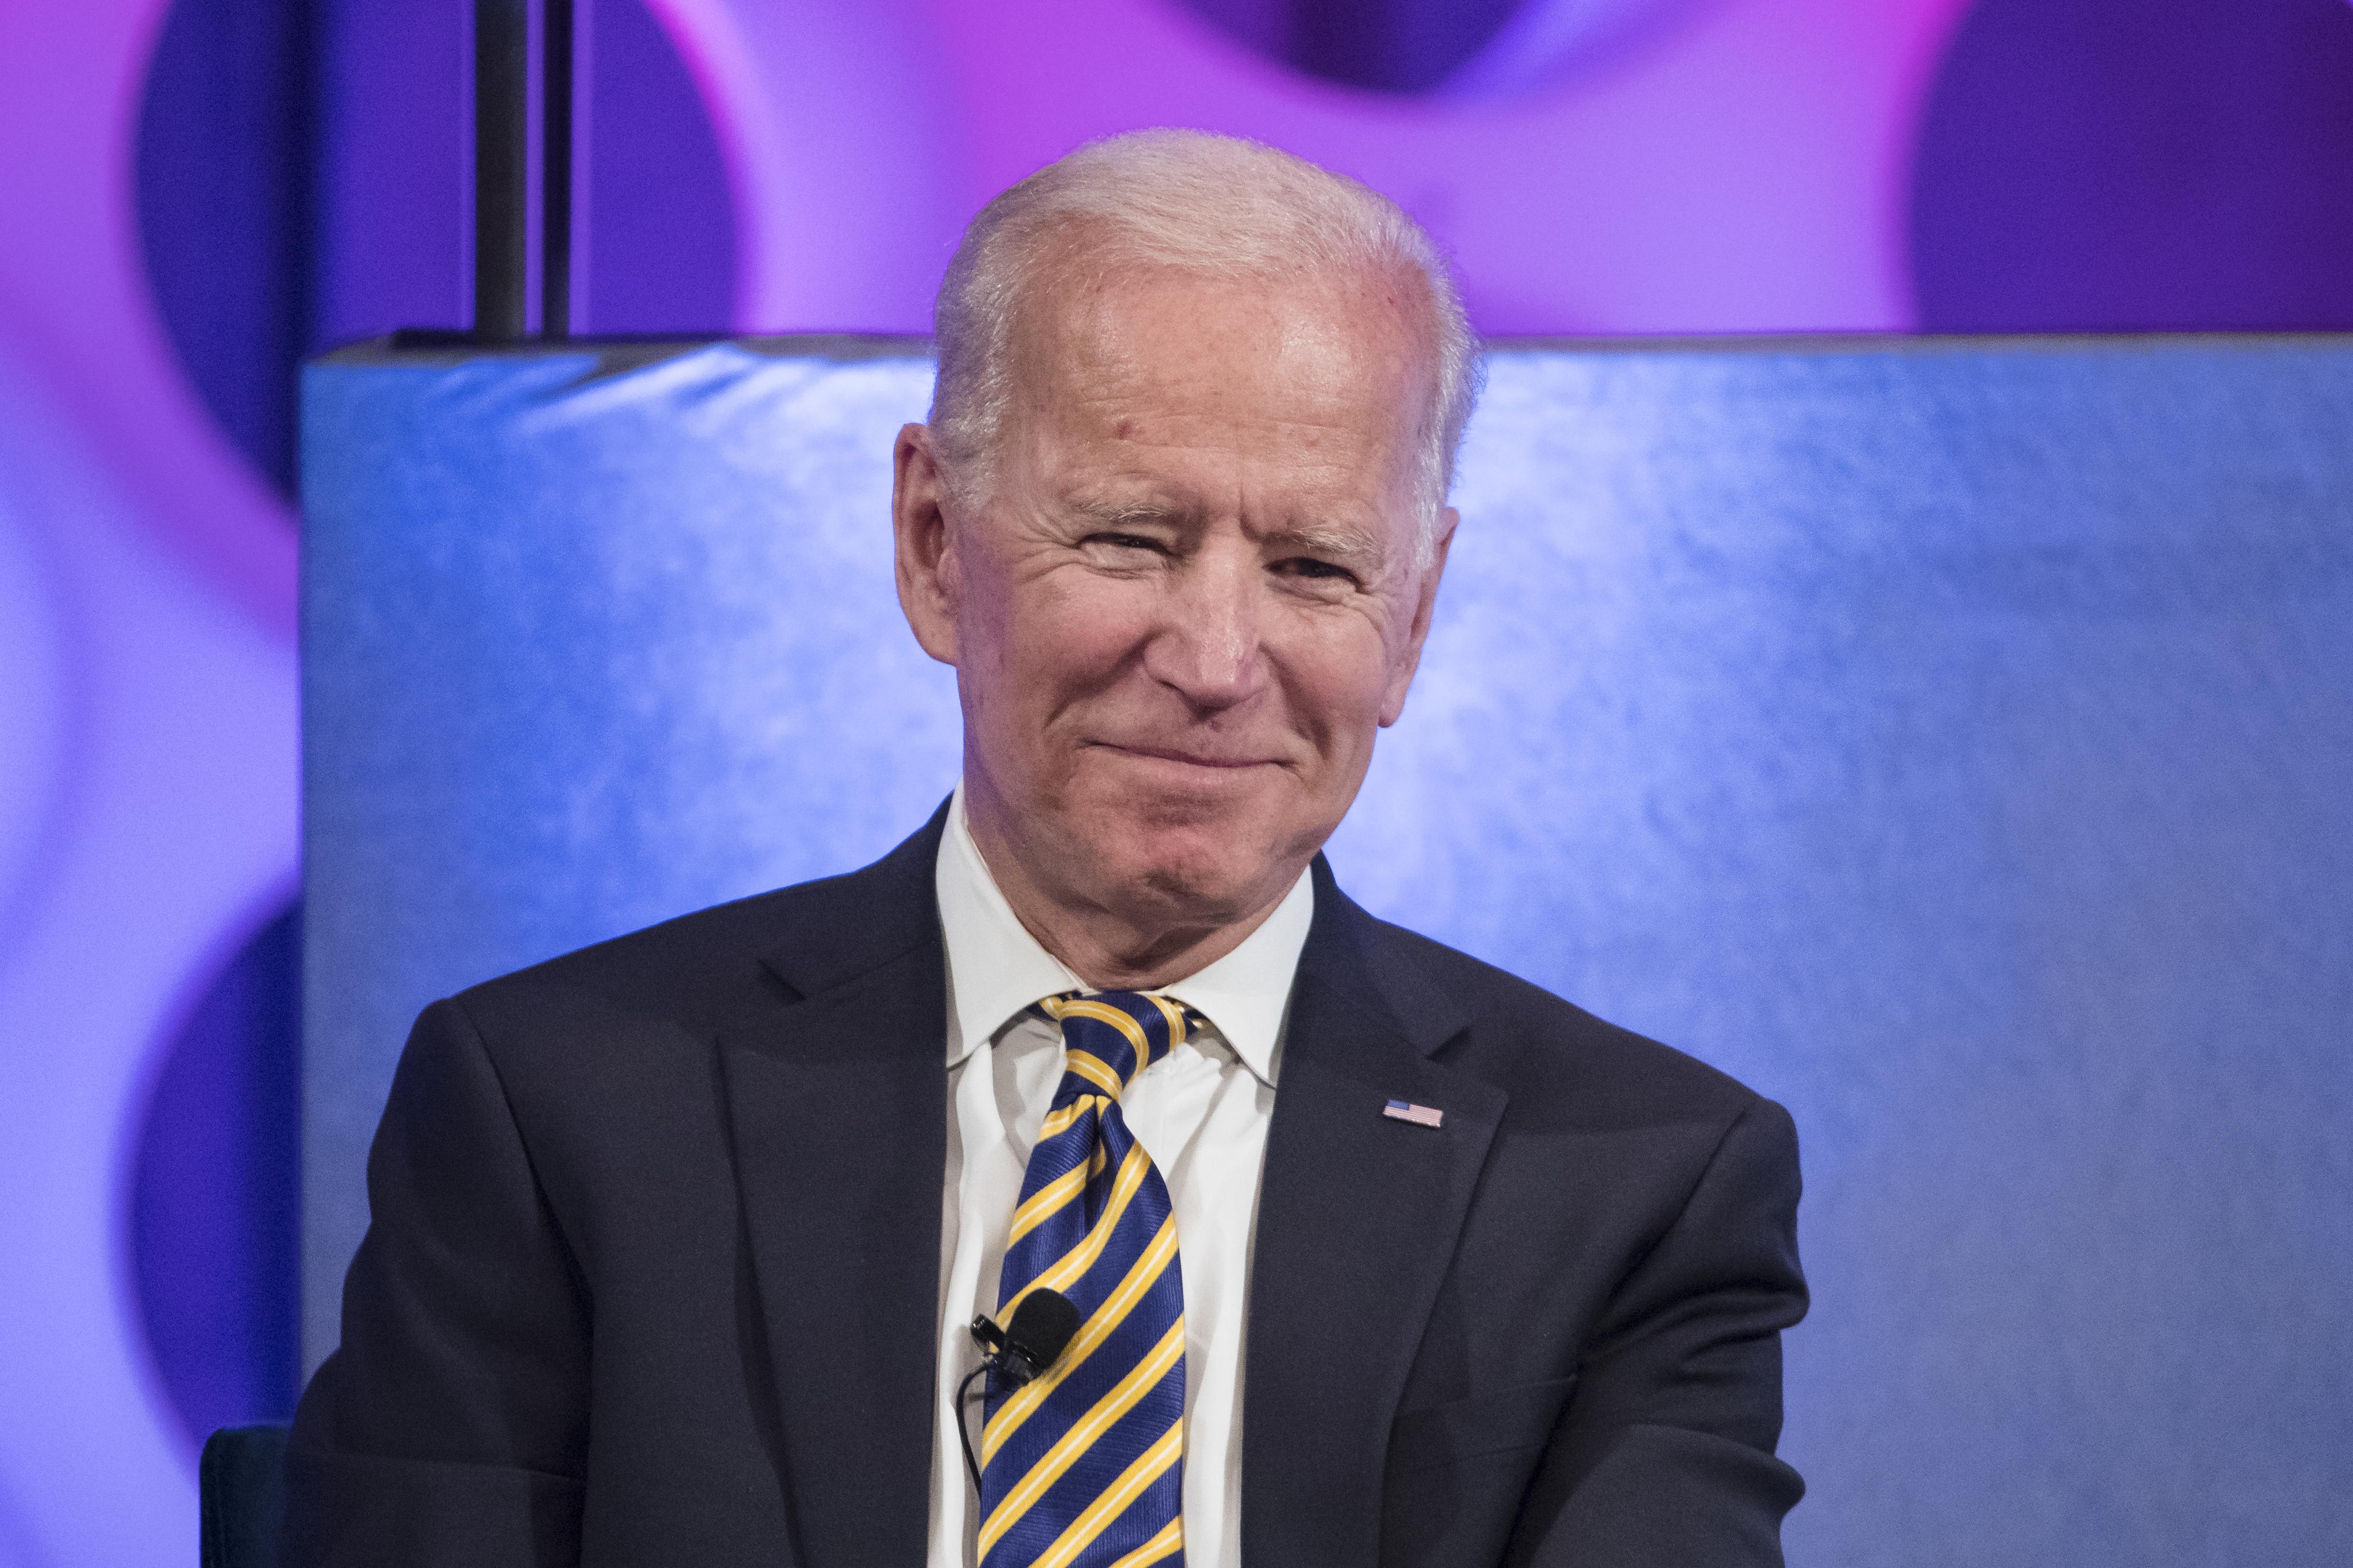 Joe Biden's presidential campaign kickoff a shameless stunt